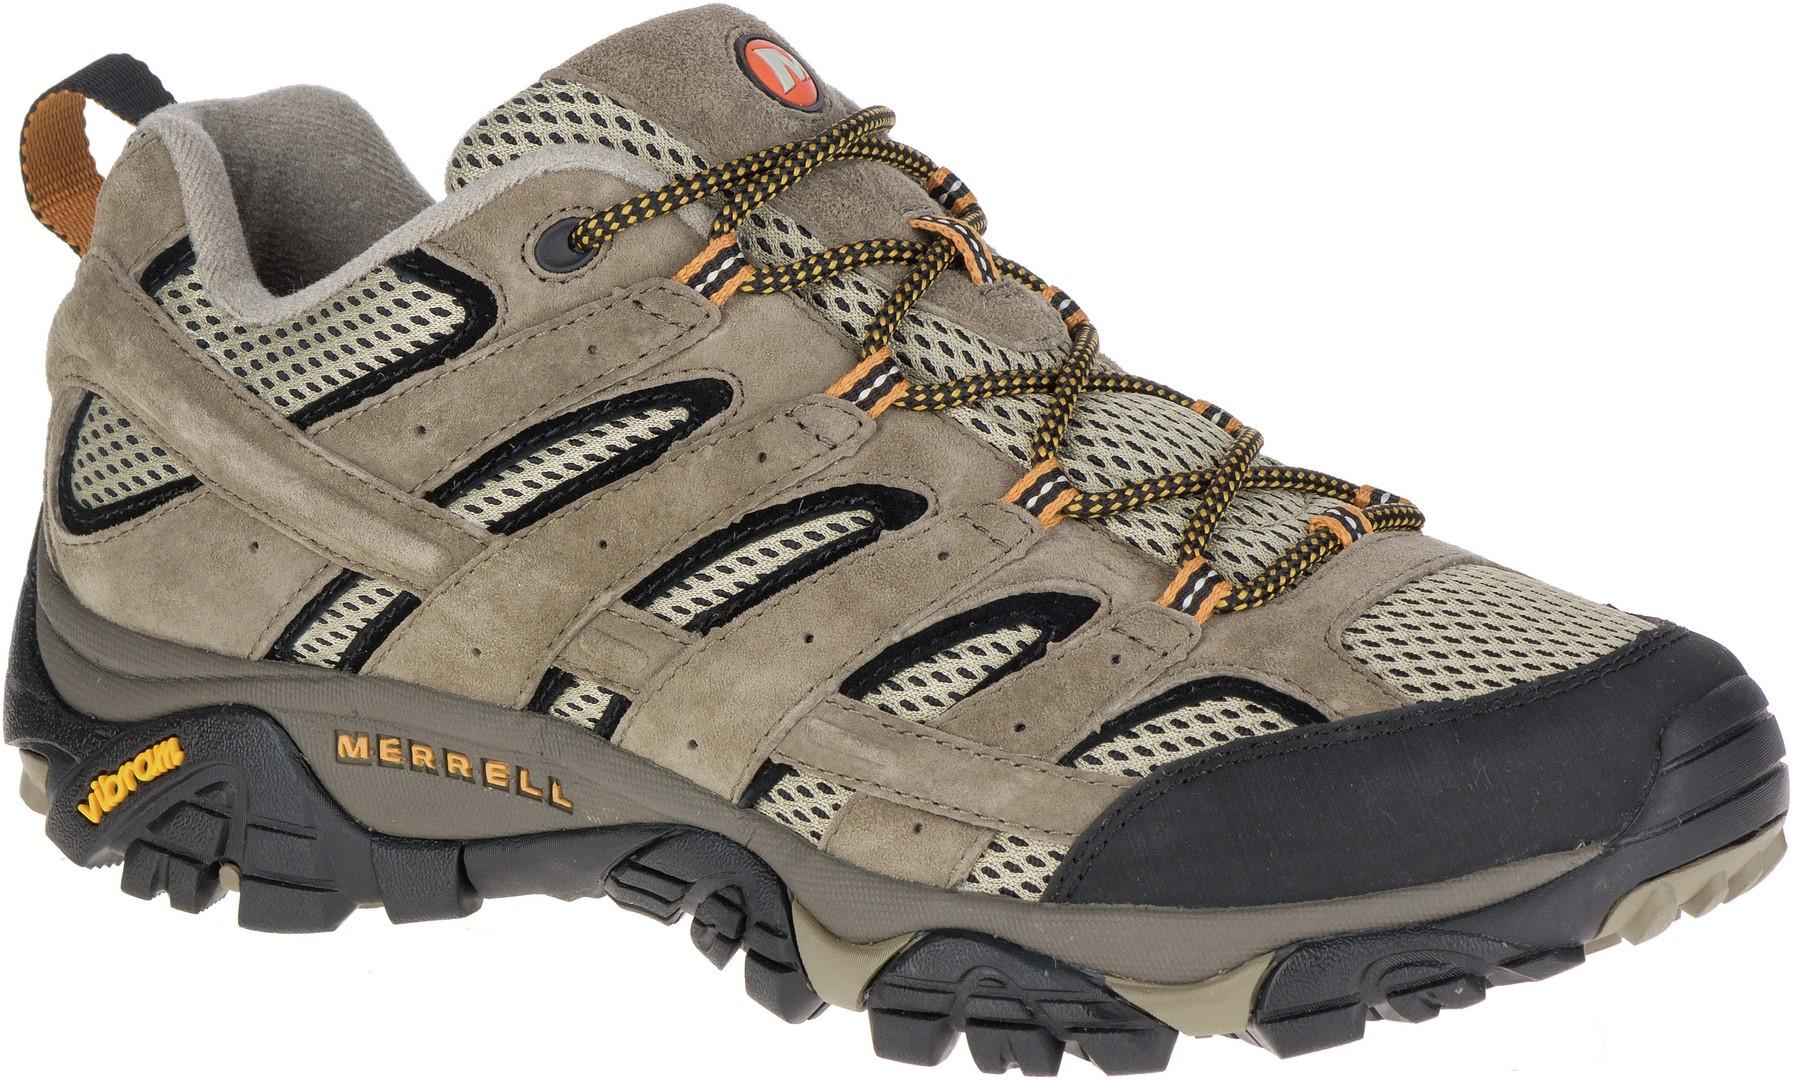 Merrell MOAB 2 VENT, muške cipele za planinarenje, braon